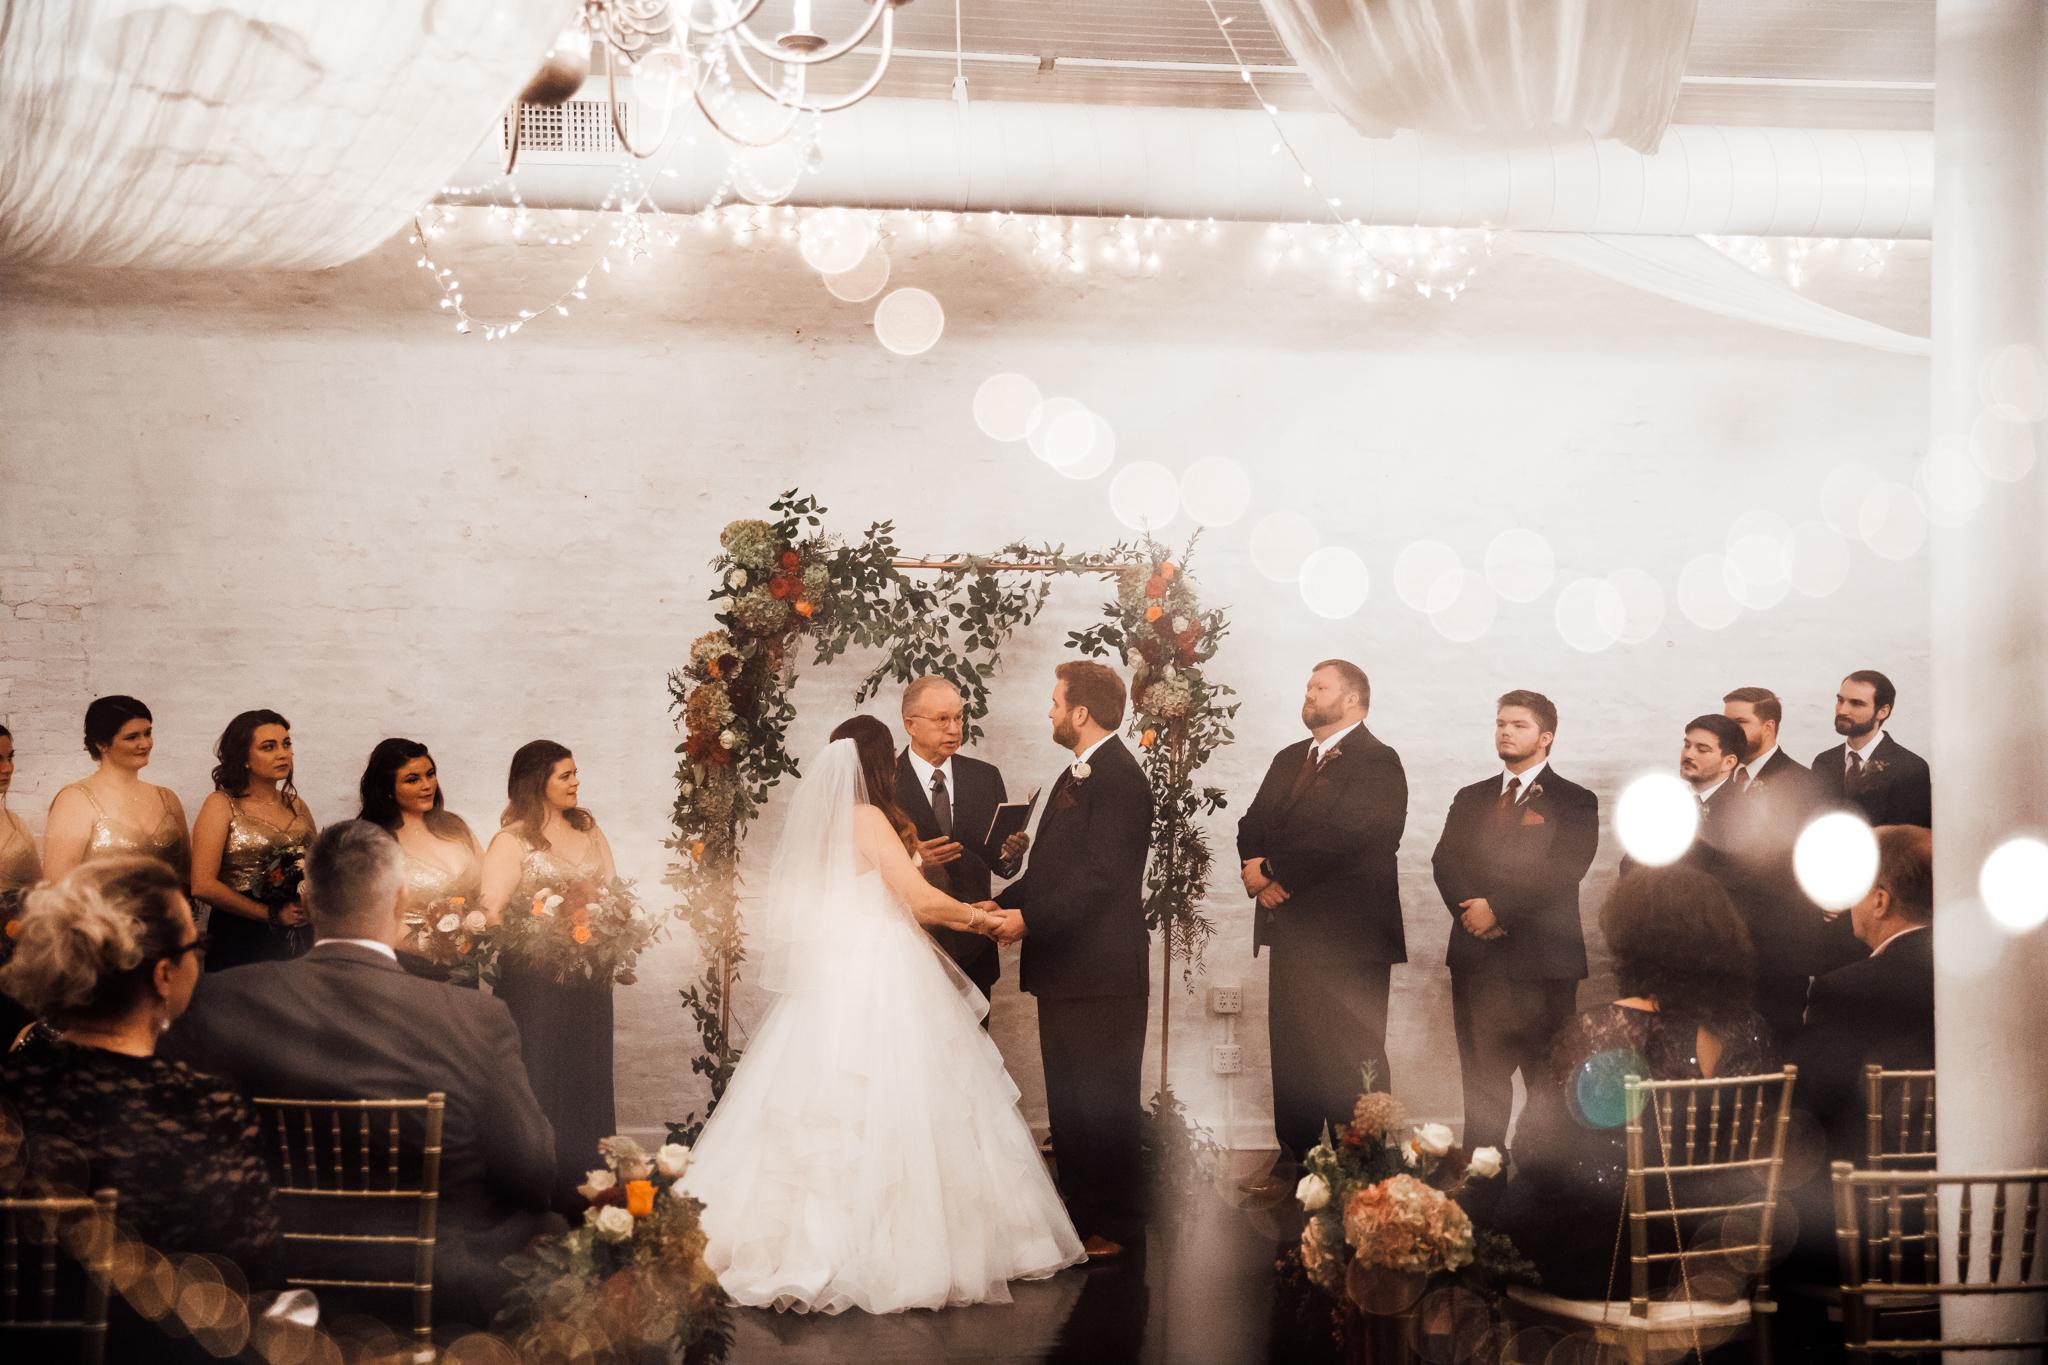 memphis-wedding-photographers-thewarmtharoundyou-ballinese-ballroom (148 of 232).jpg